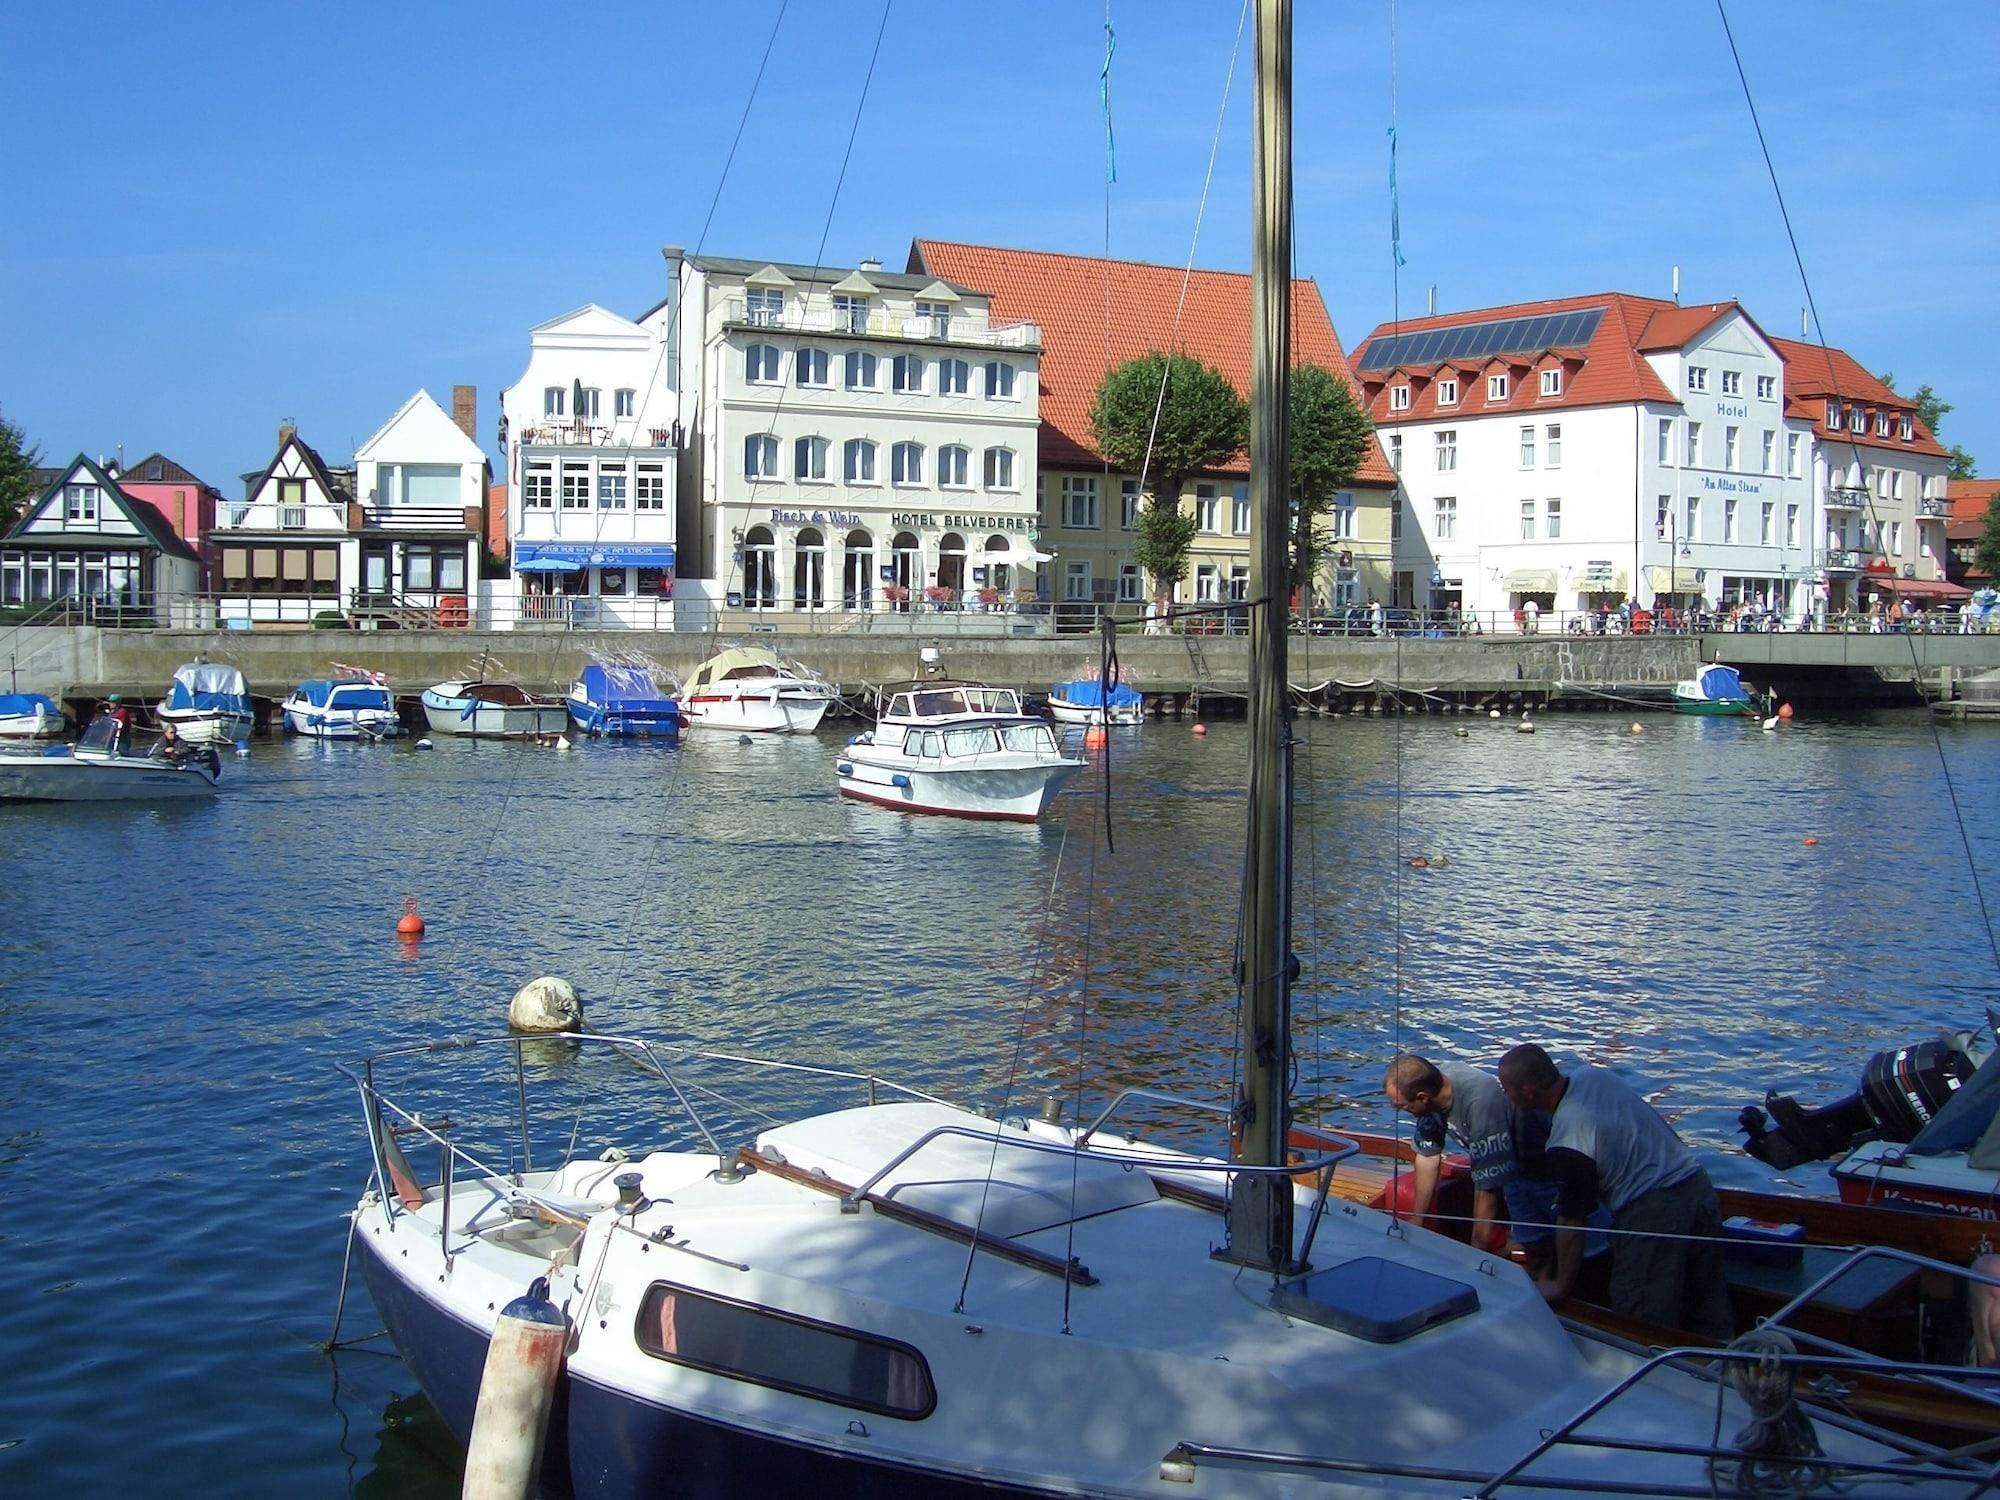 Hotel Belvedere, Rostock